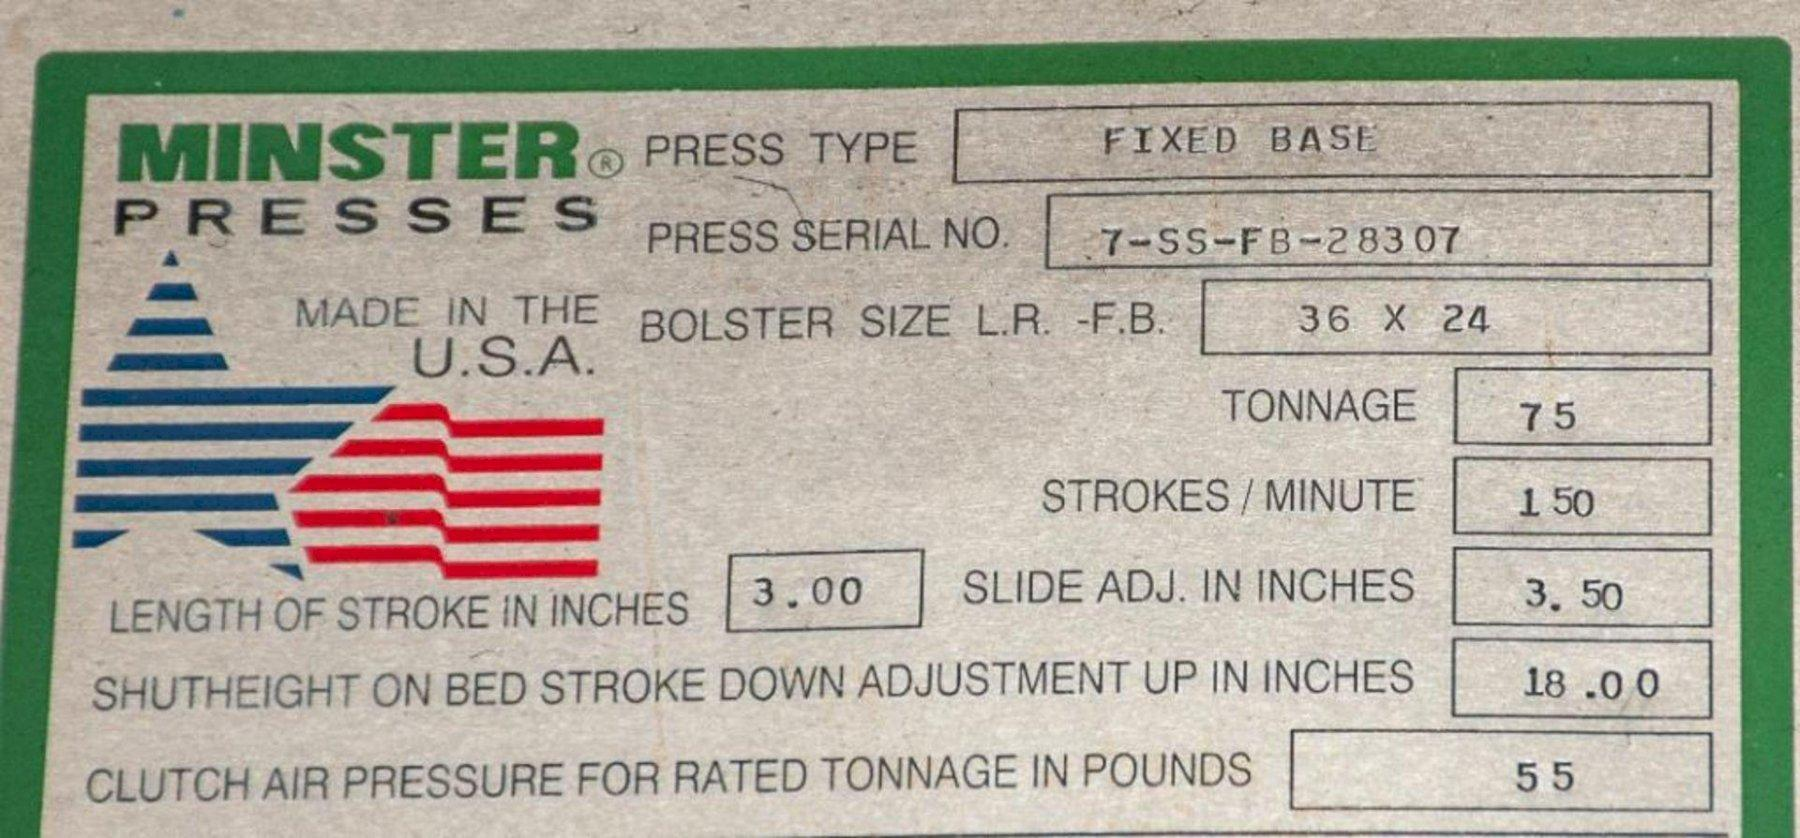 75 TON MINSTER MODEL #7 GAP FRAME PRESS: STOCK #15353